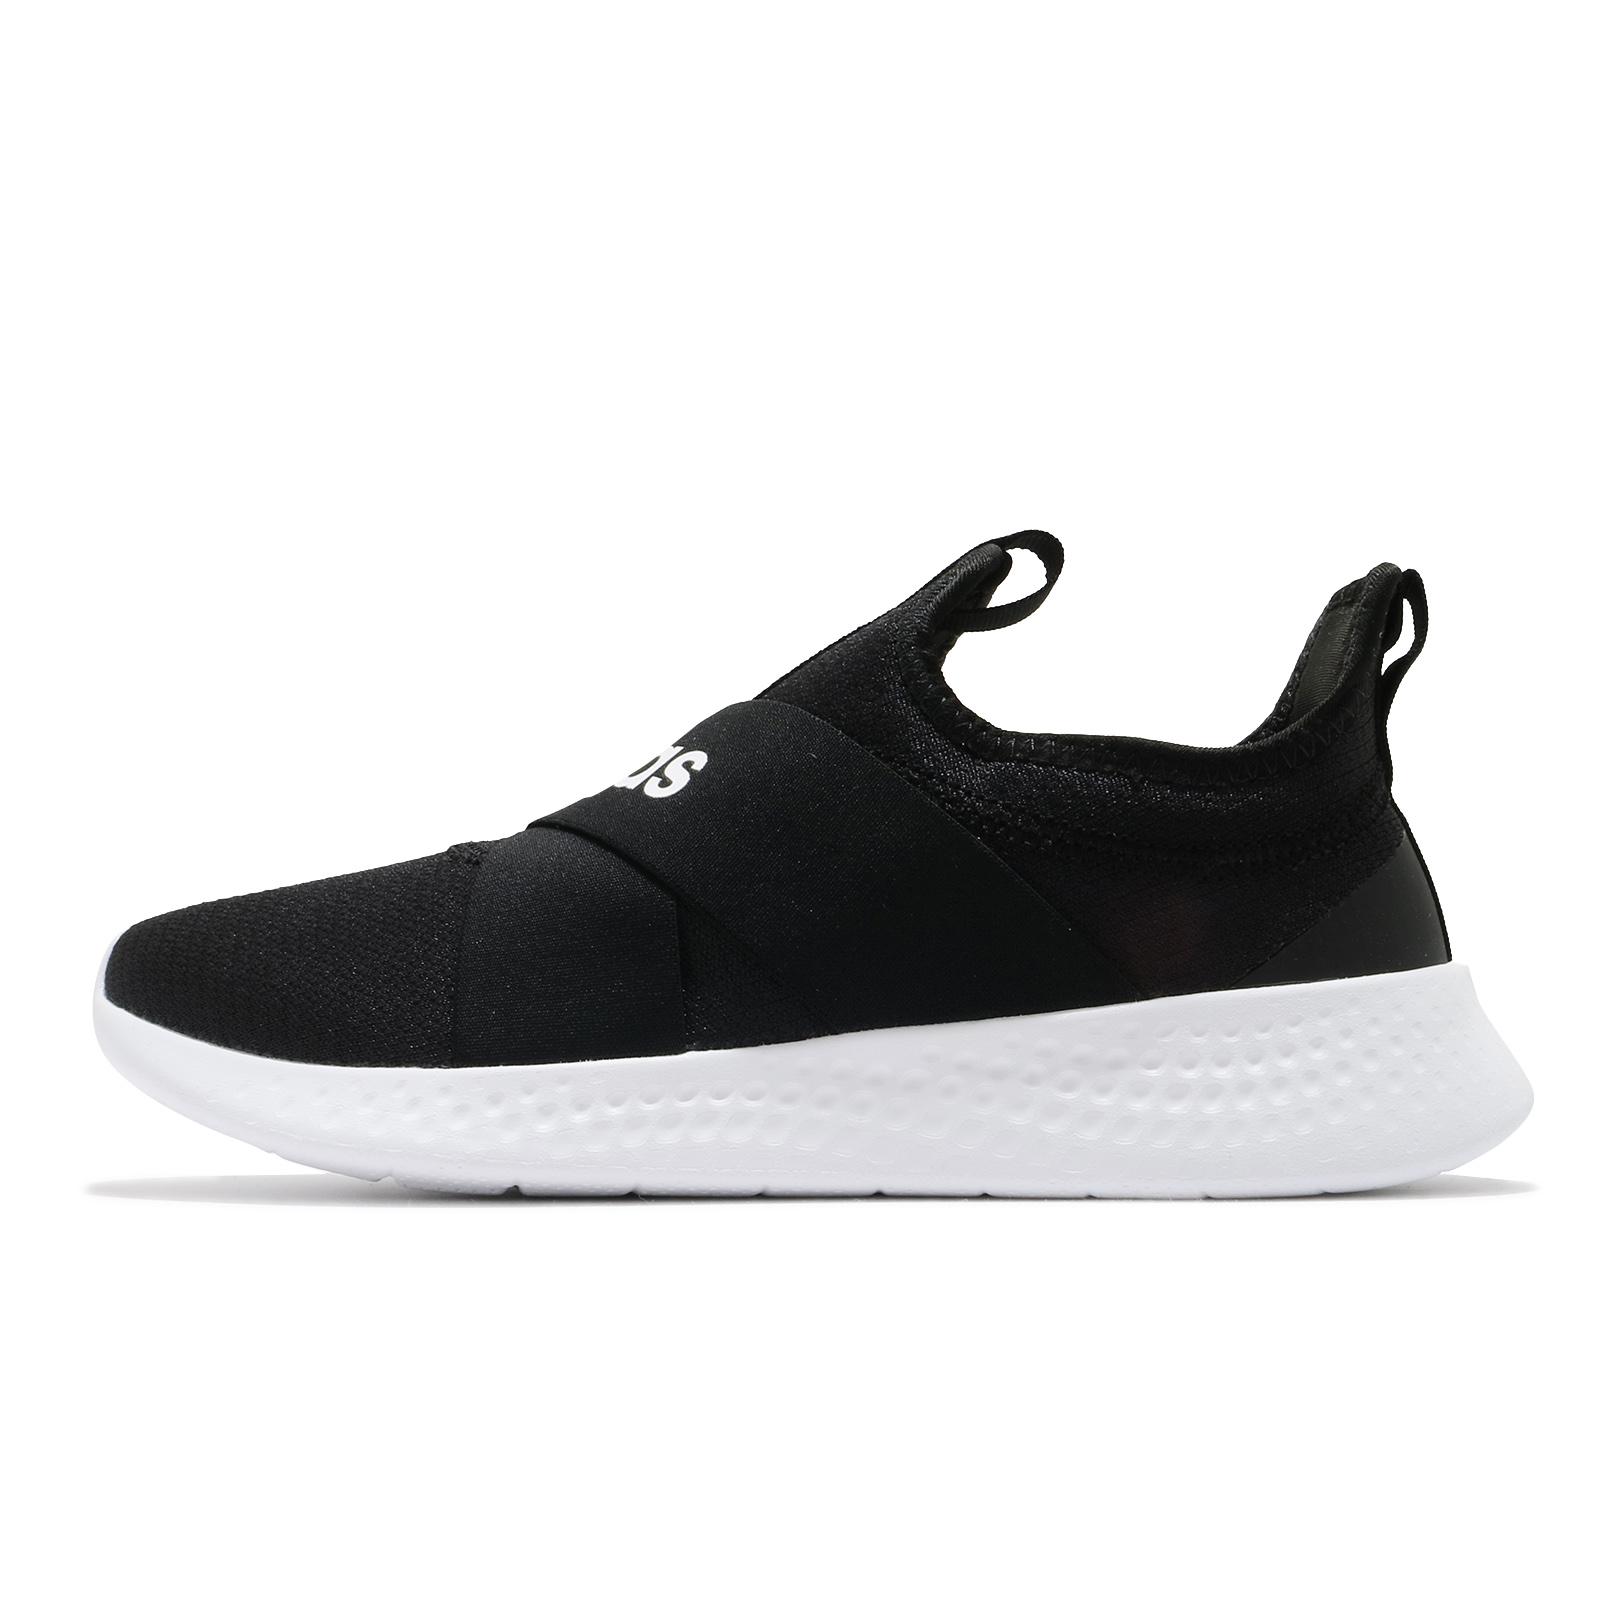 adidas 休閒鞋 Puremotion Adapt 黑白 三葉草 襪套式 小白鞋 女鞋 【ACS】